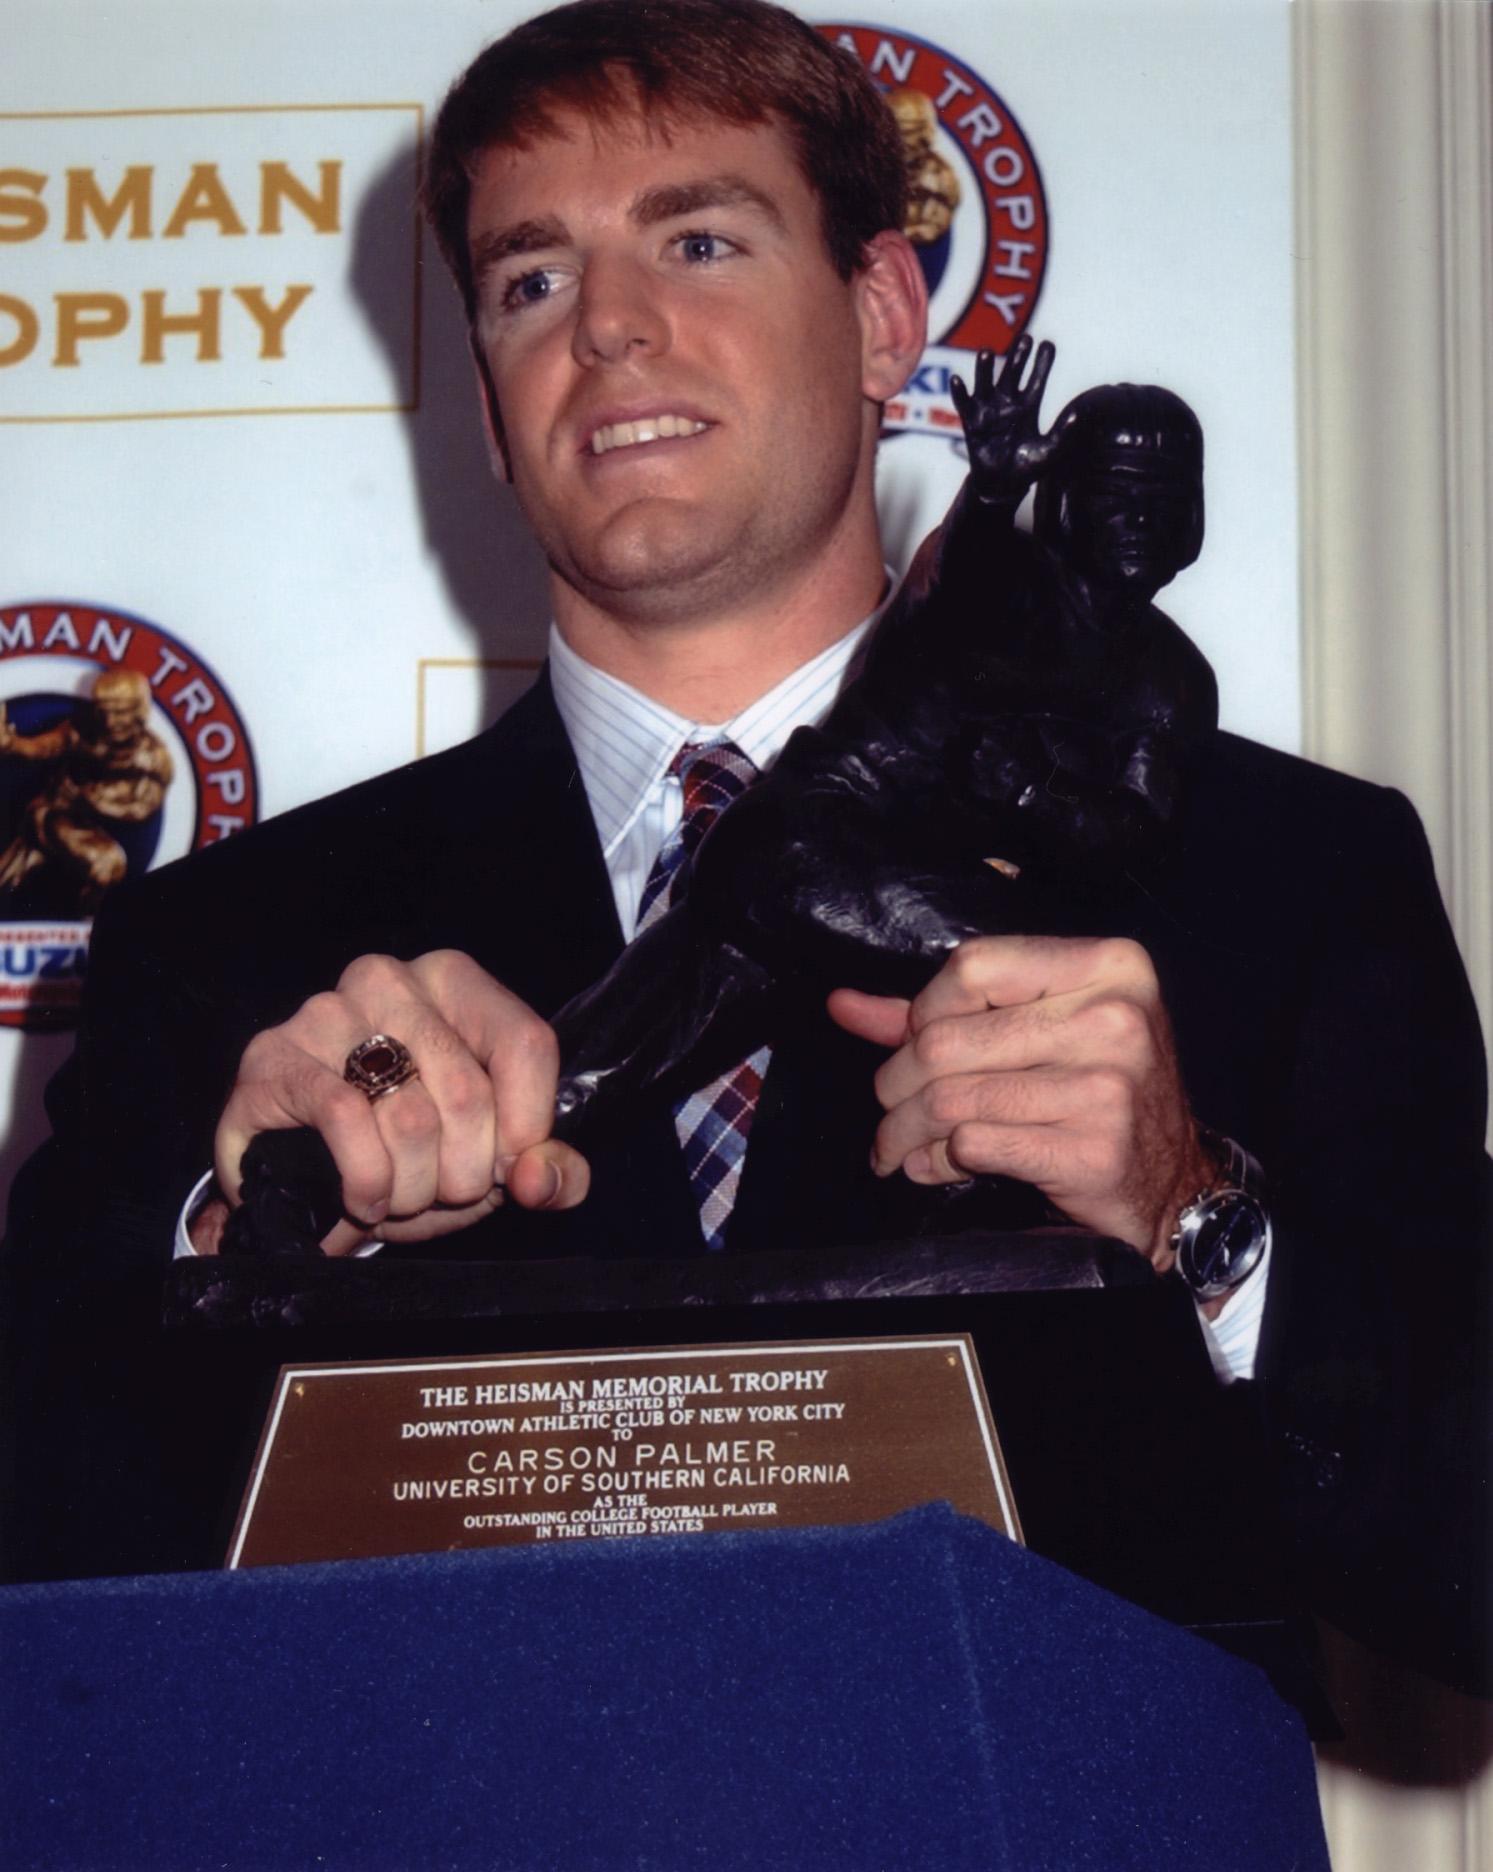 Carson Palmer with Heisman Trophy Award